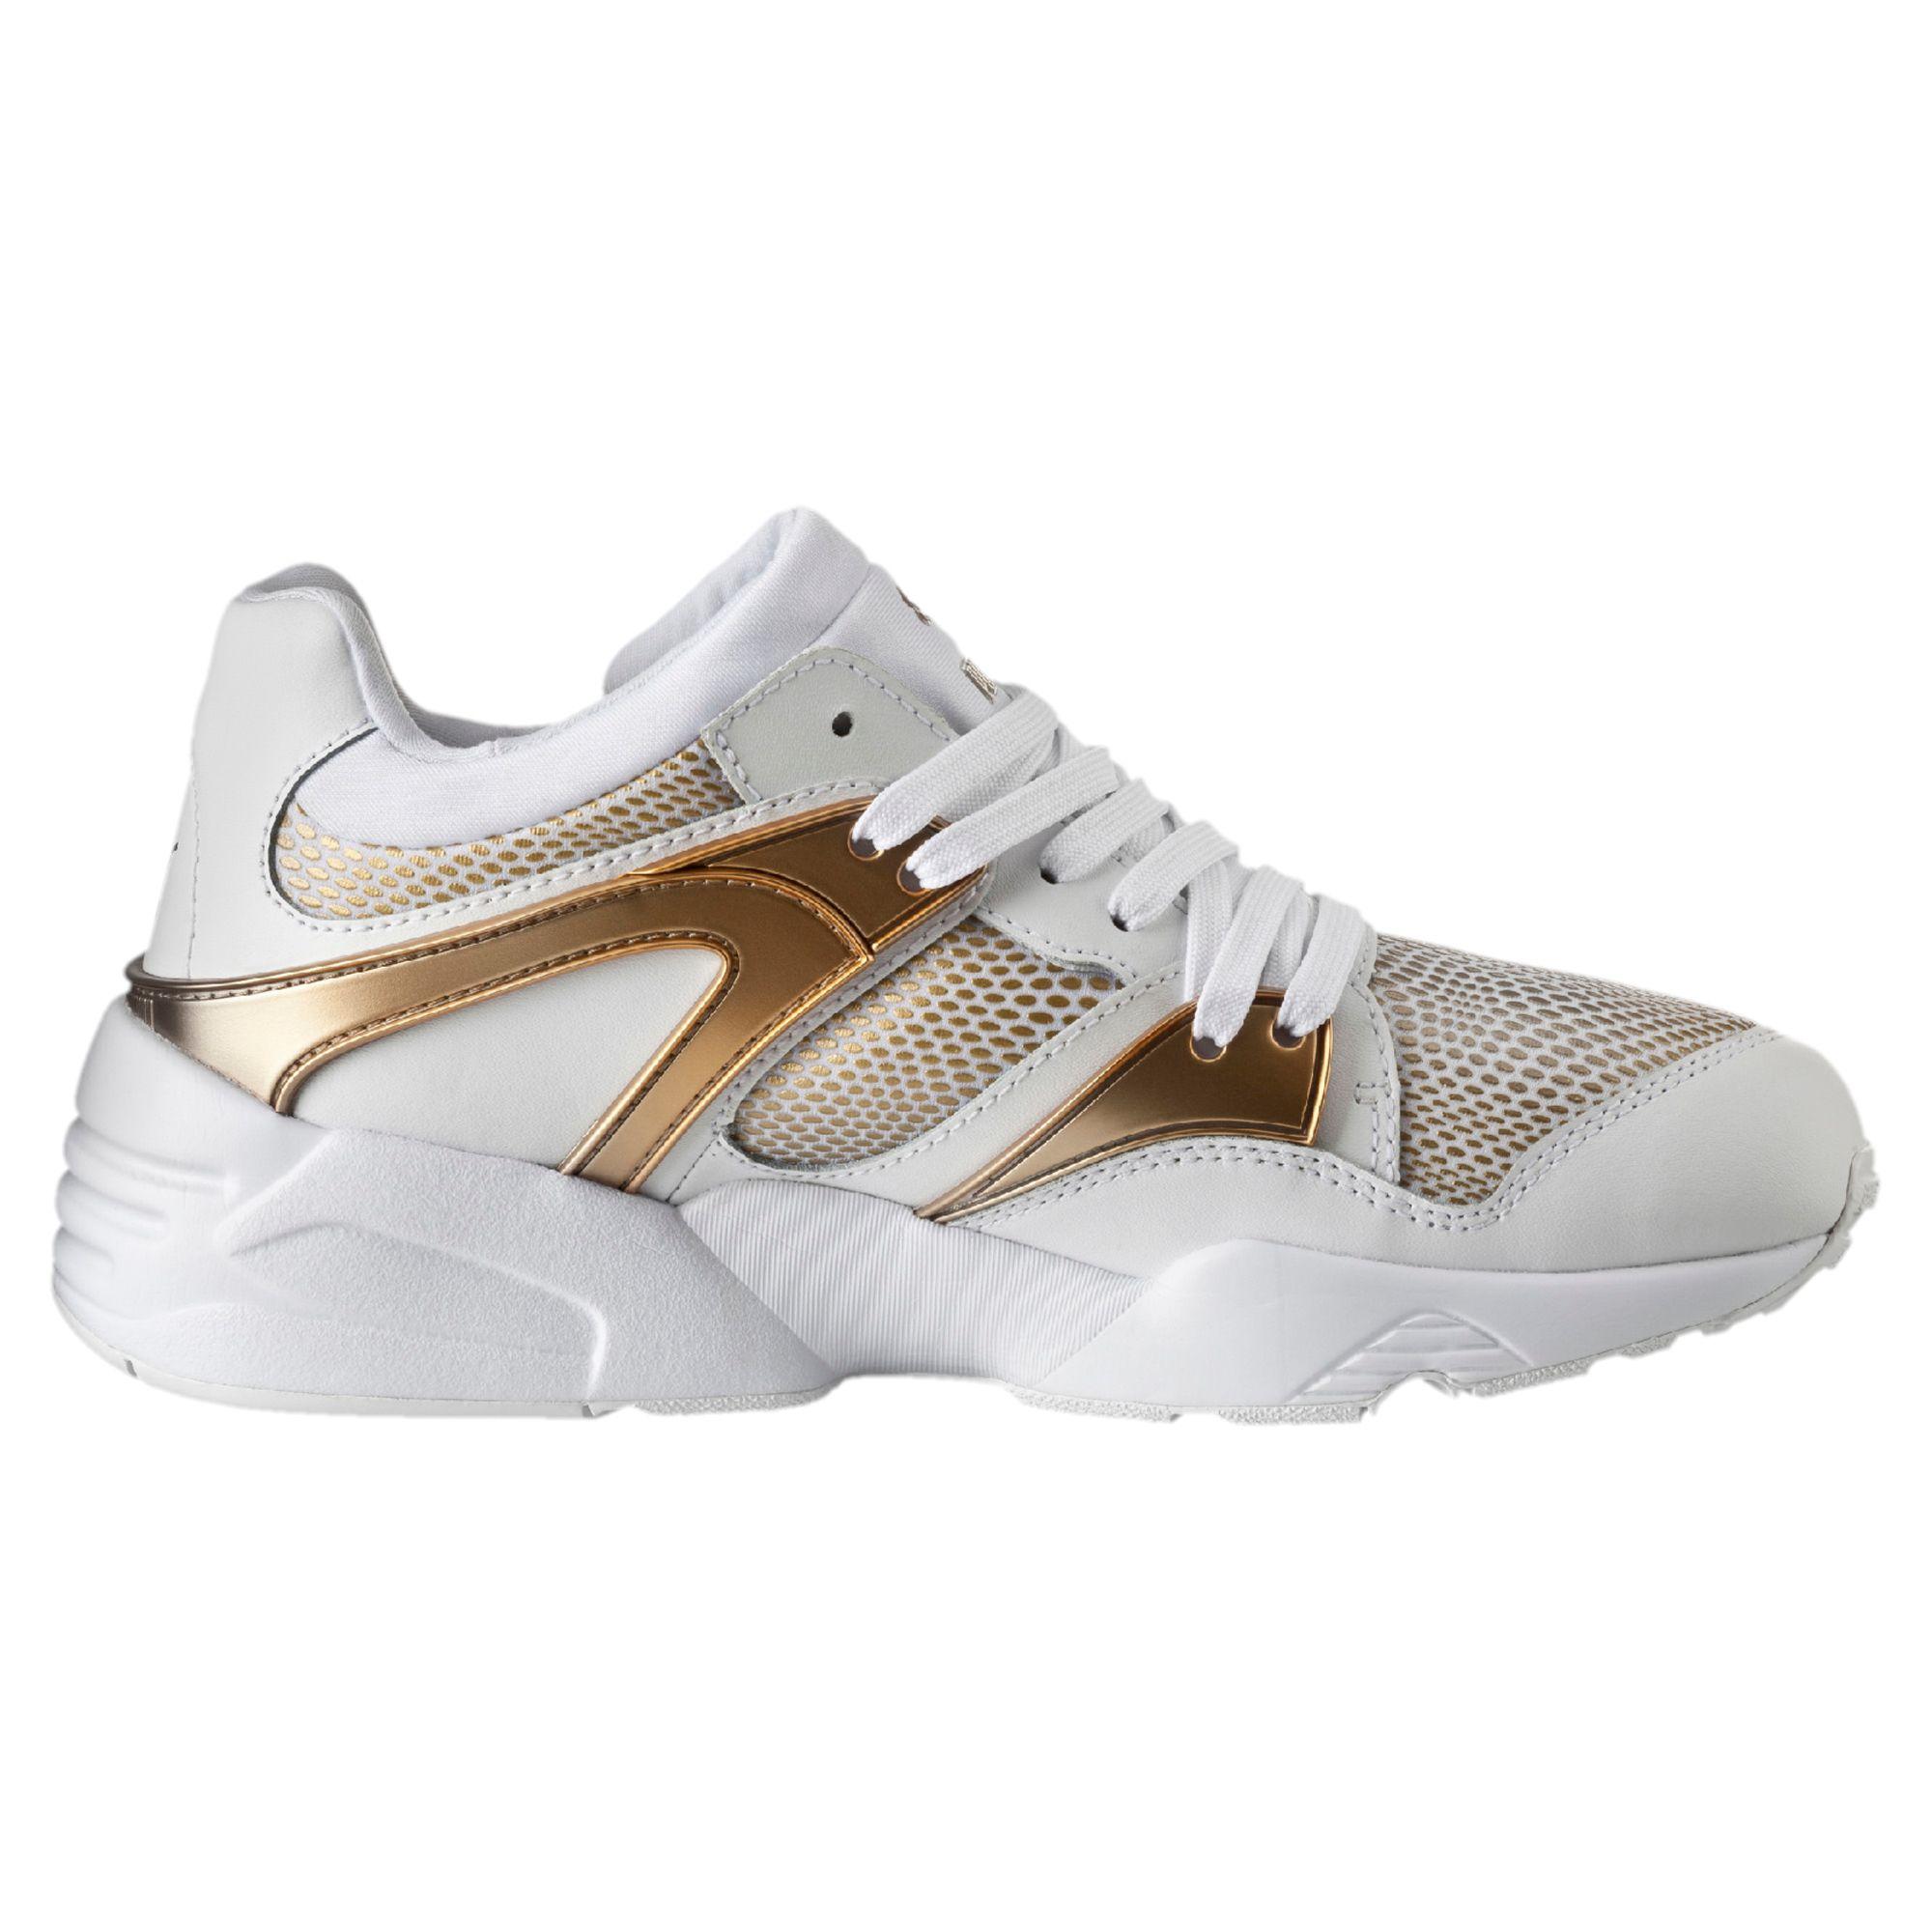 trinomic puma gold